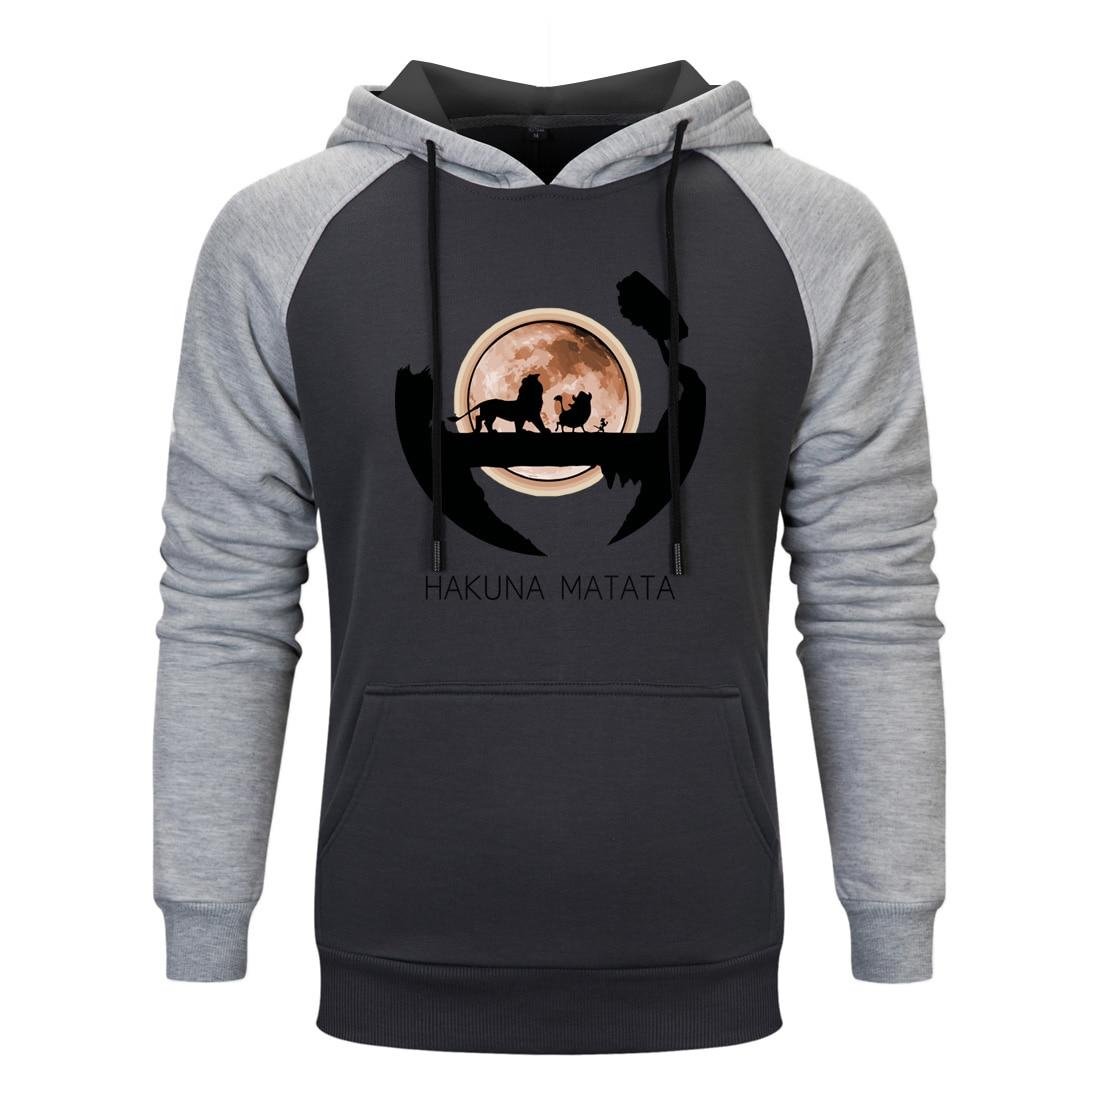 The Lion King Simba Printed Mens Raglan Hoodie Sweatshirts Man 2020 Hakuna Matata Fashion Casual Pullovers Men Spring Autumn Top